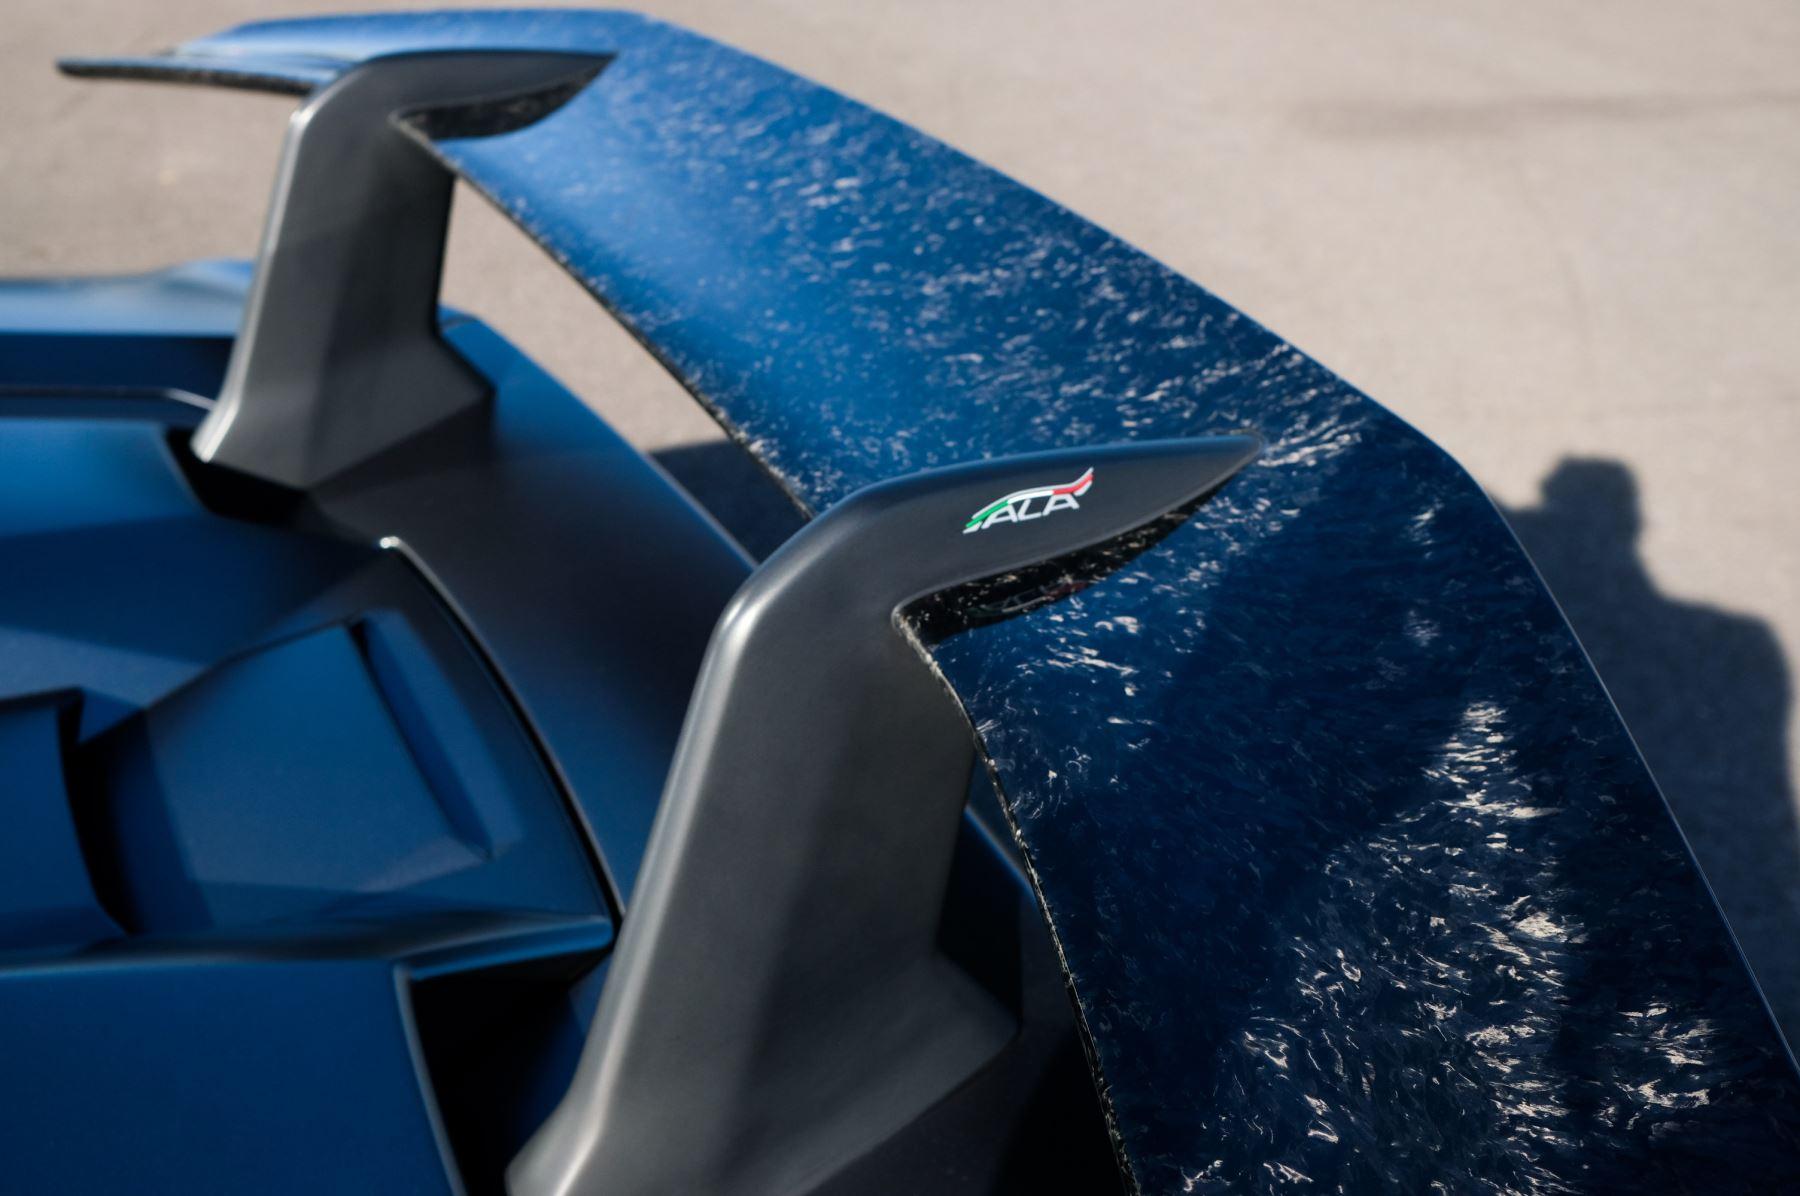 Lamborghini Huracan Performante LP 640-4 2dr LDF - Carbon Ceramic Brakes - Carbon Fiber Features - Comfort Seats image 14